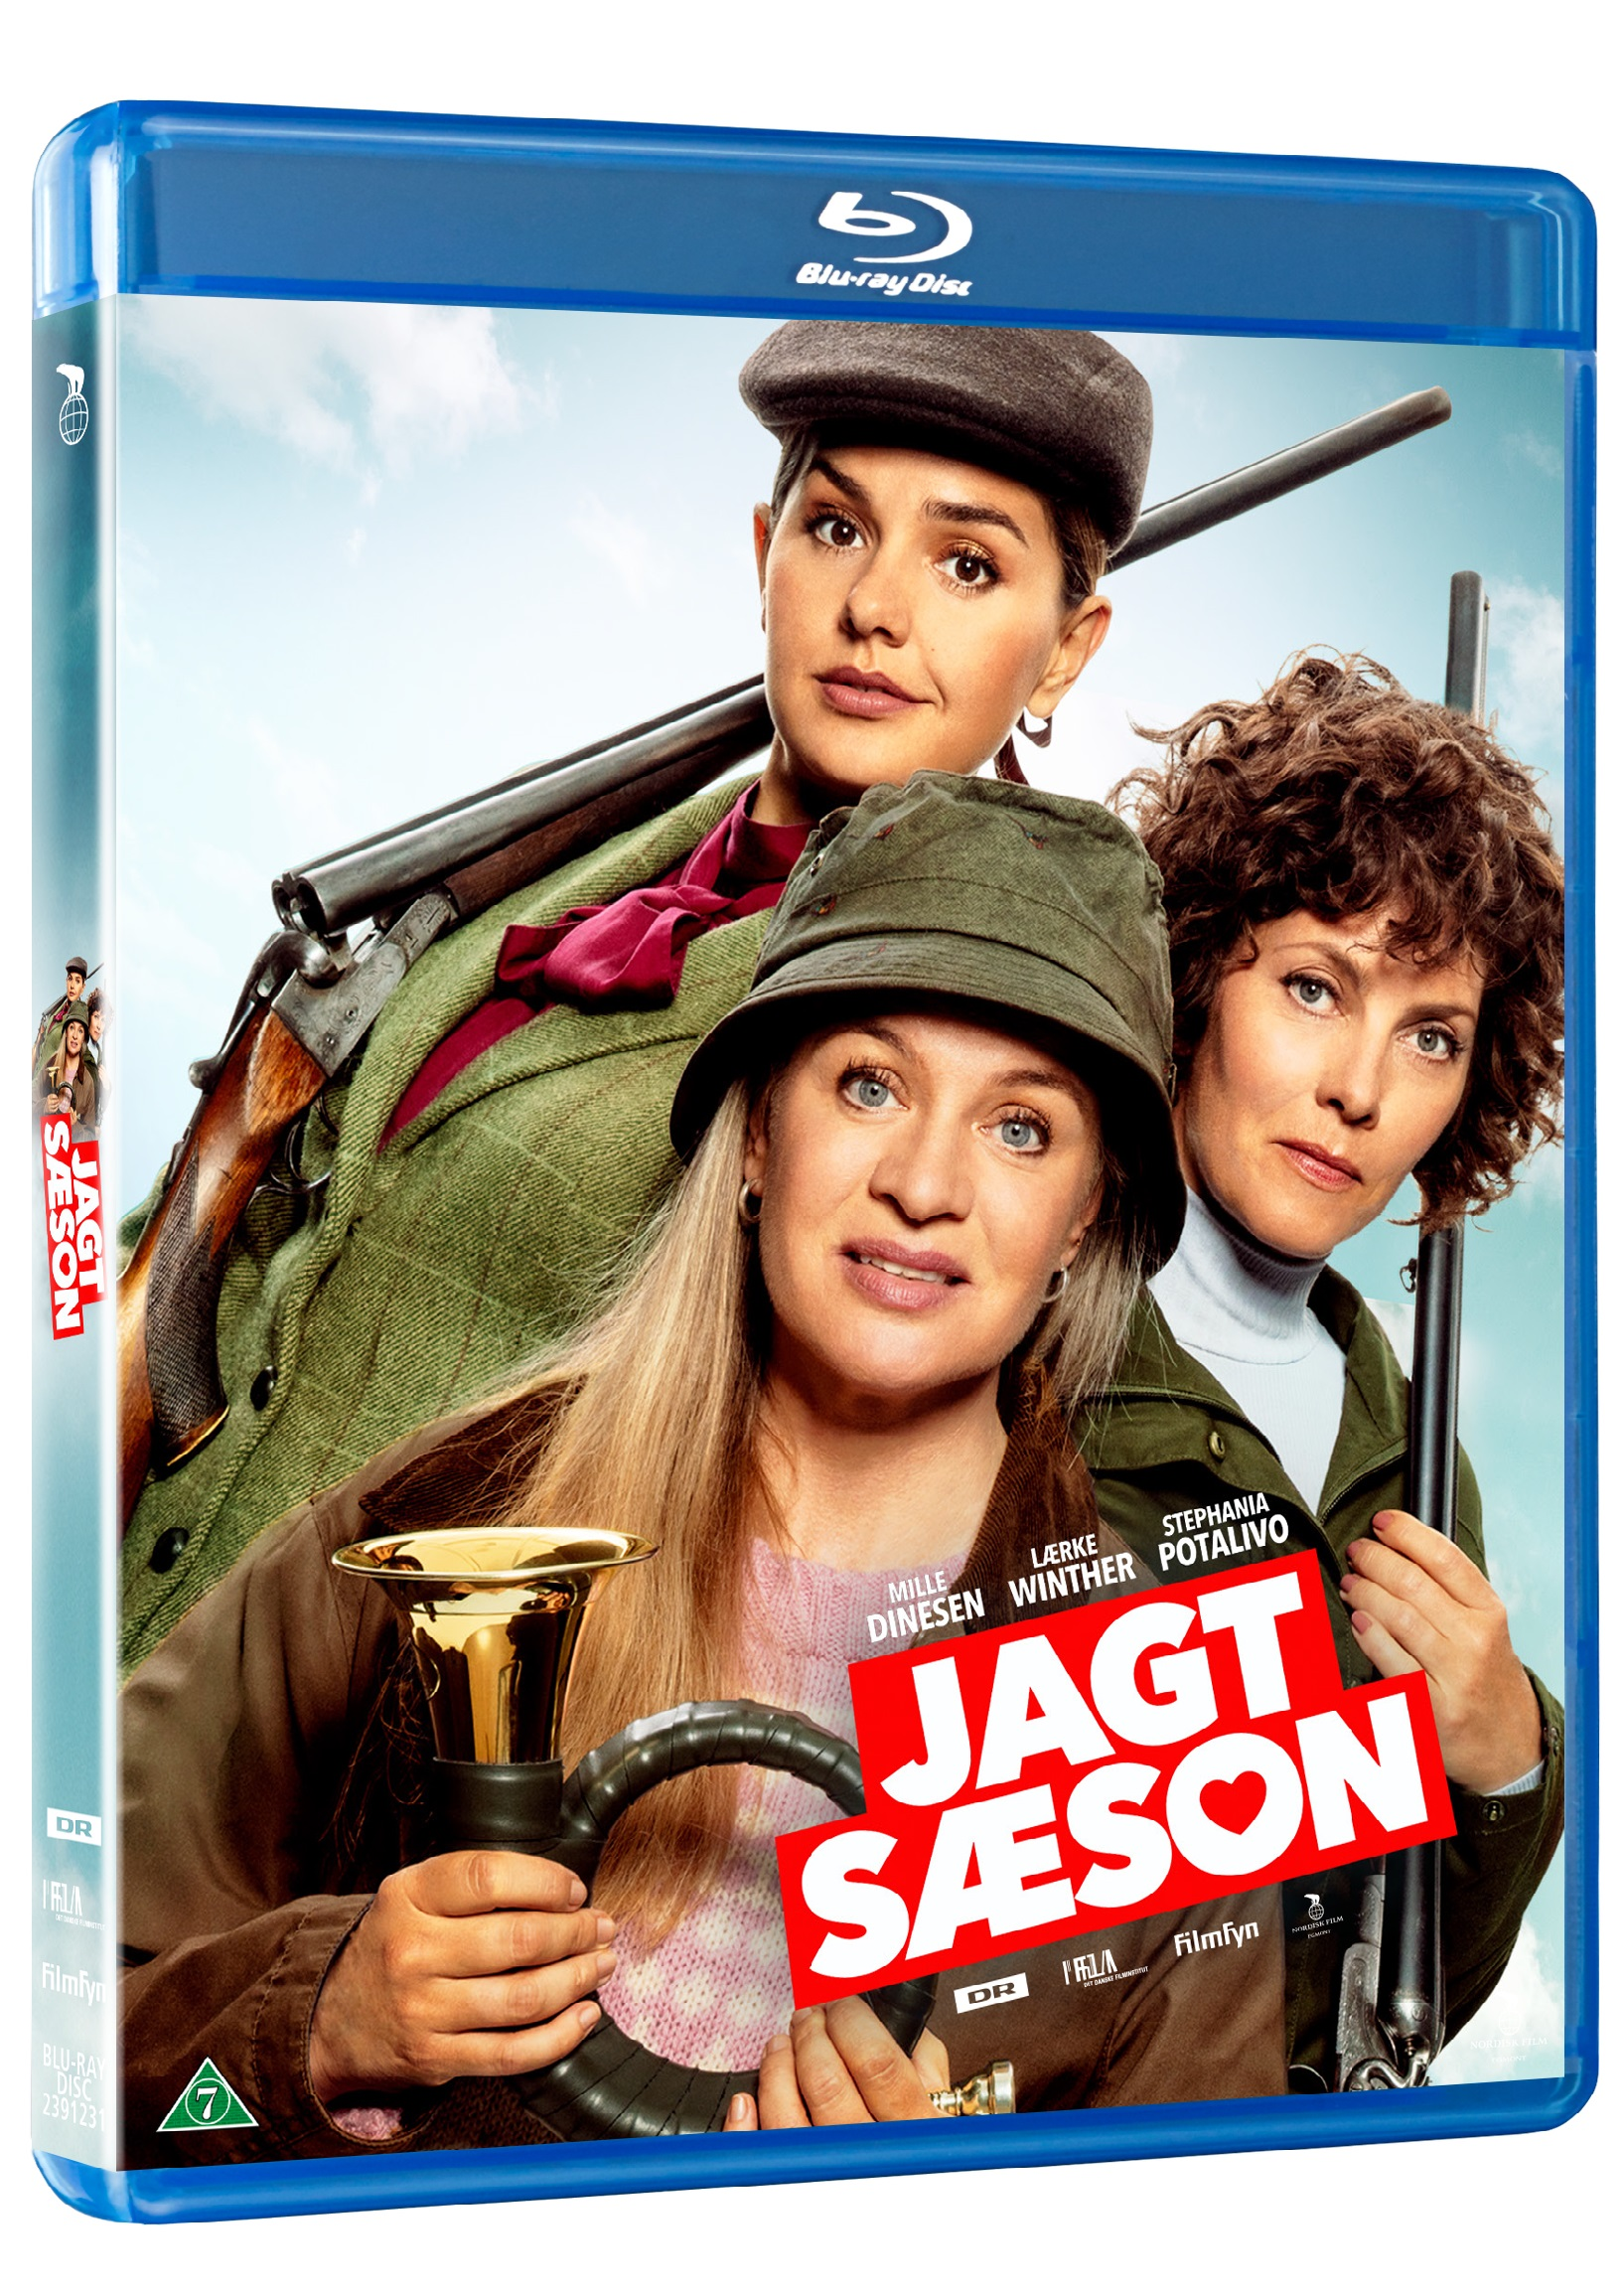 Jagtsæson -  - Film -  - 5708758725033 - 21/2-2020